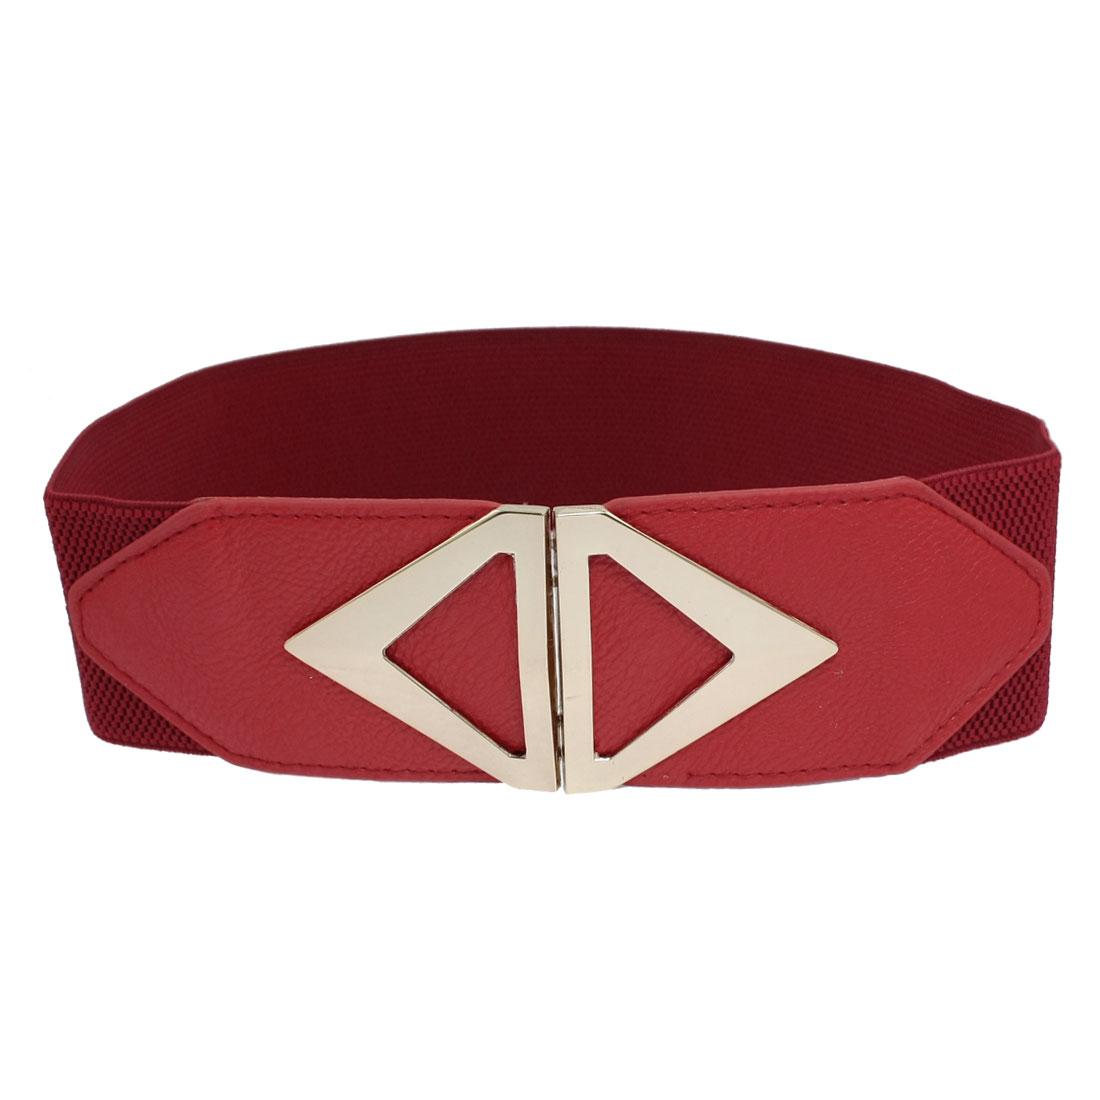 Women Fashion Metalic Rhombus Buckle Wide Red Elastic Cinch Waist Belt